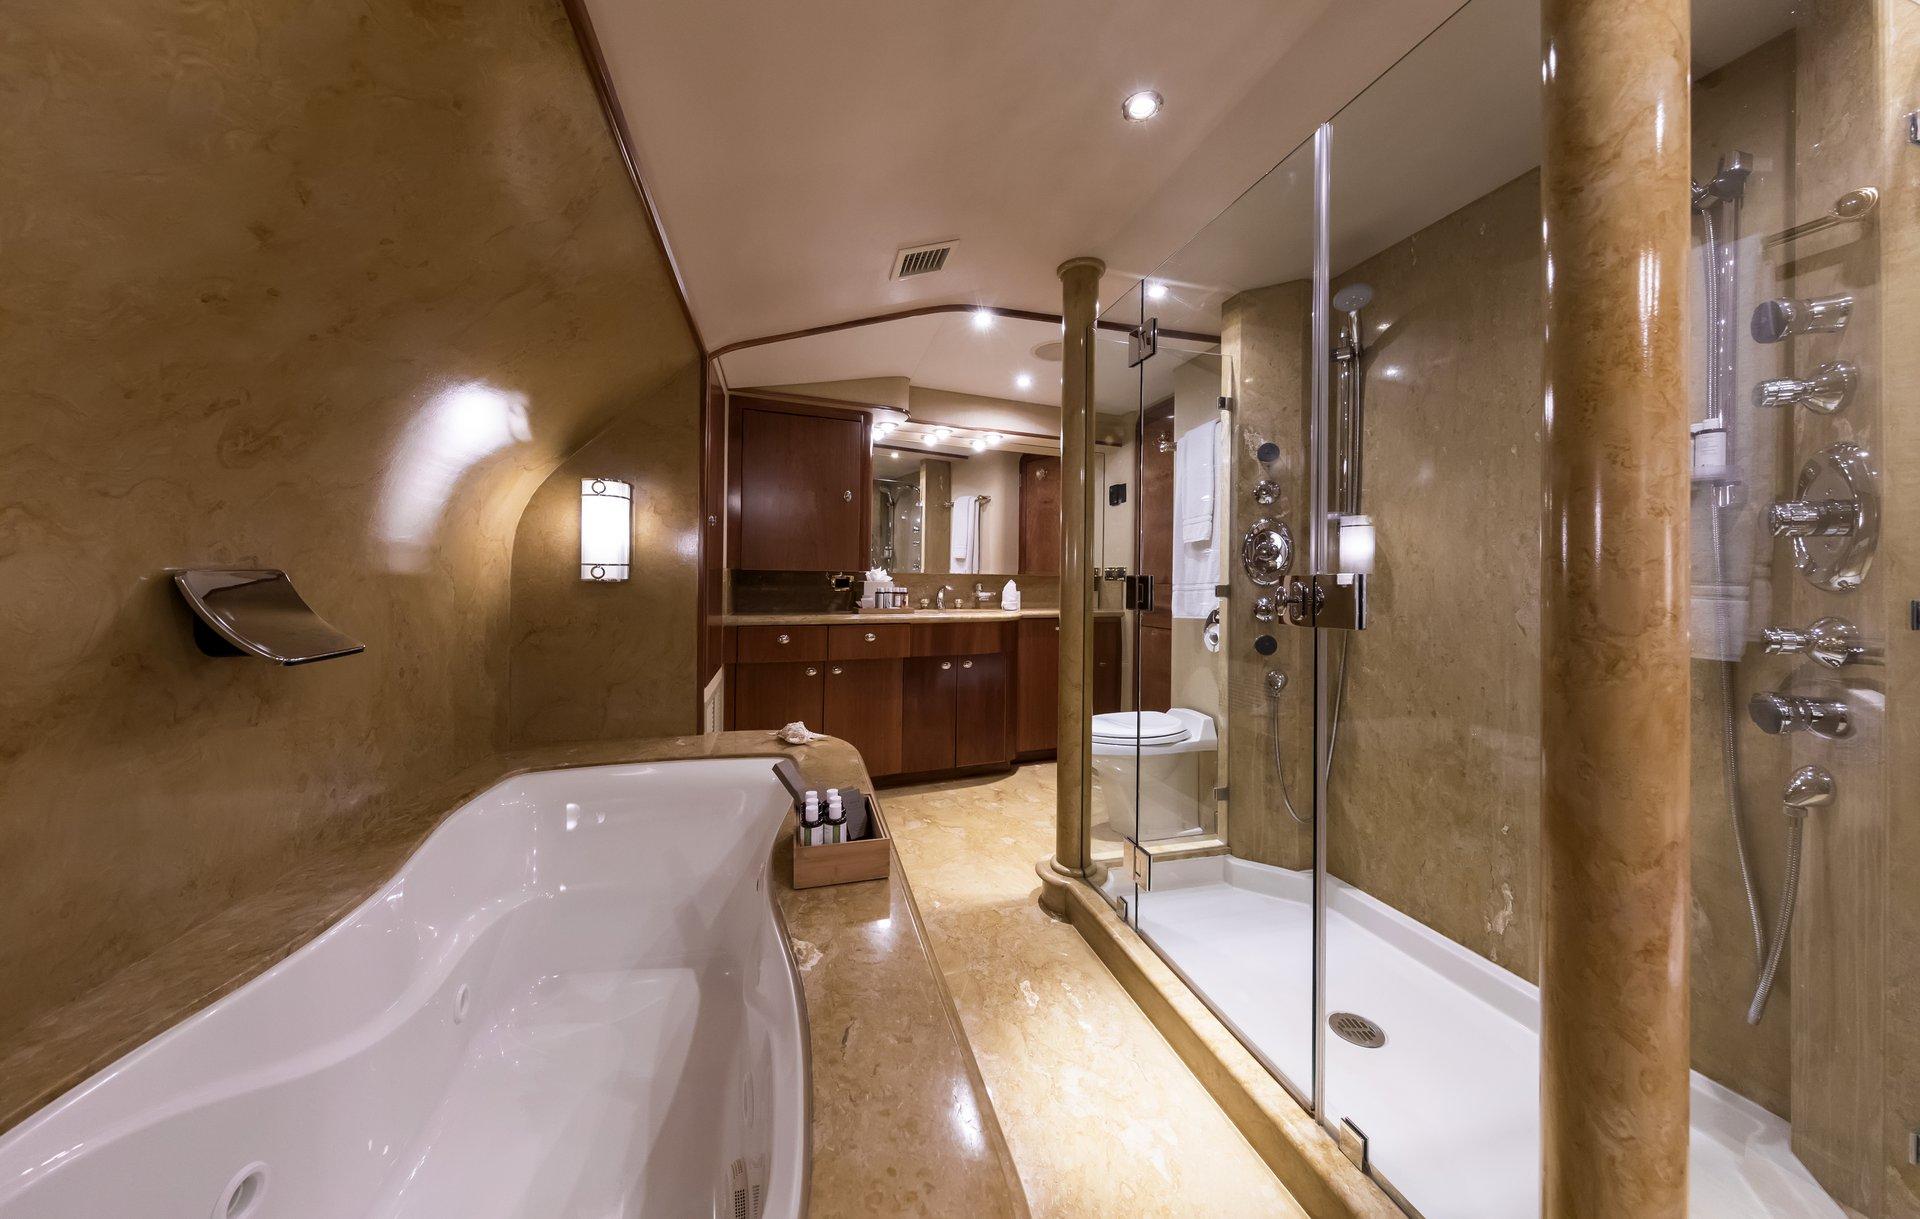 m/y endless summer yacht for charter bathroom